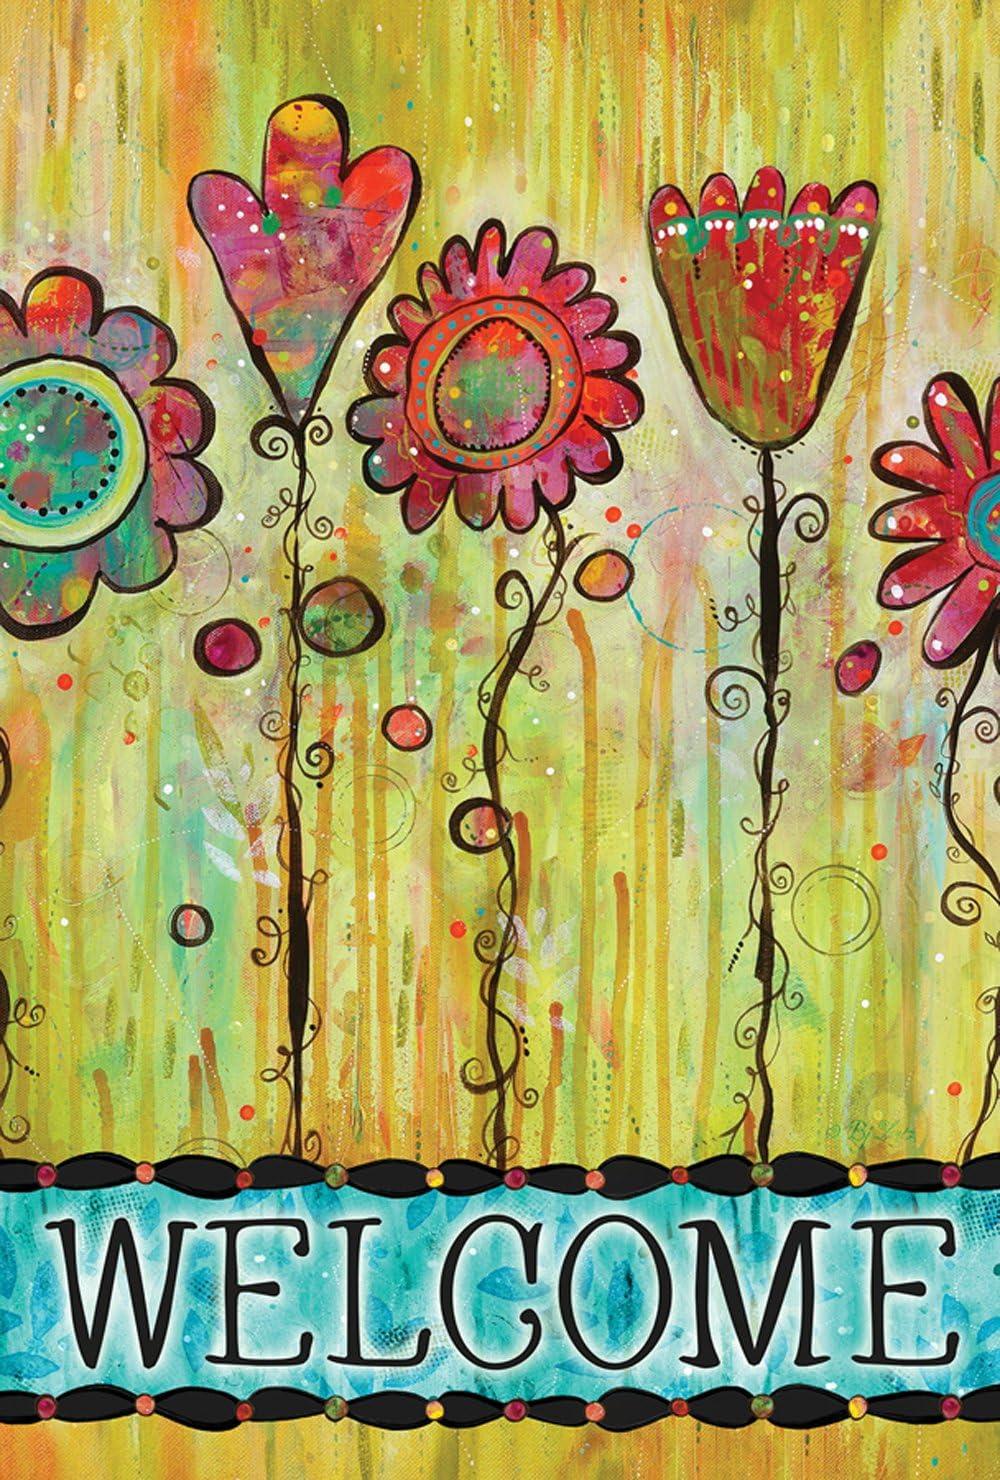 Toland Home Garden Welcome Blooms 12.5 x 18 Inch Decorative Spring Summer Abstract Flower Garden Flag